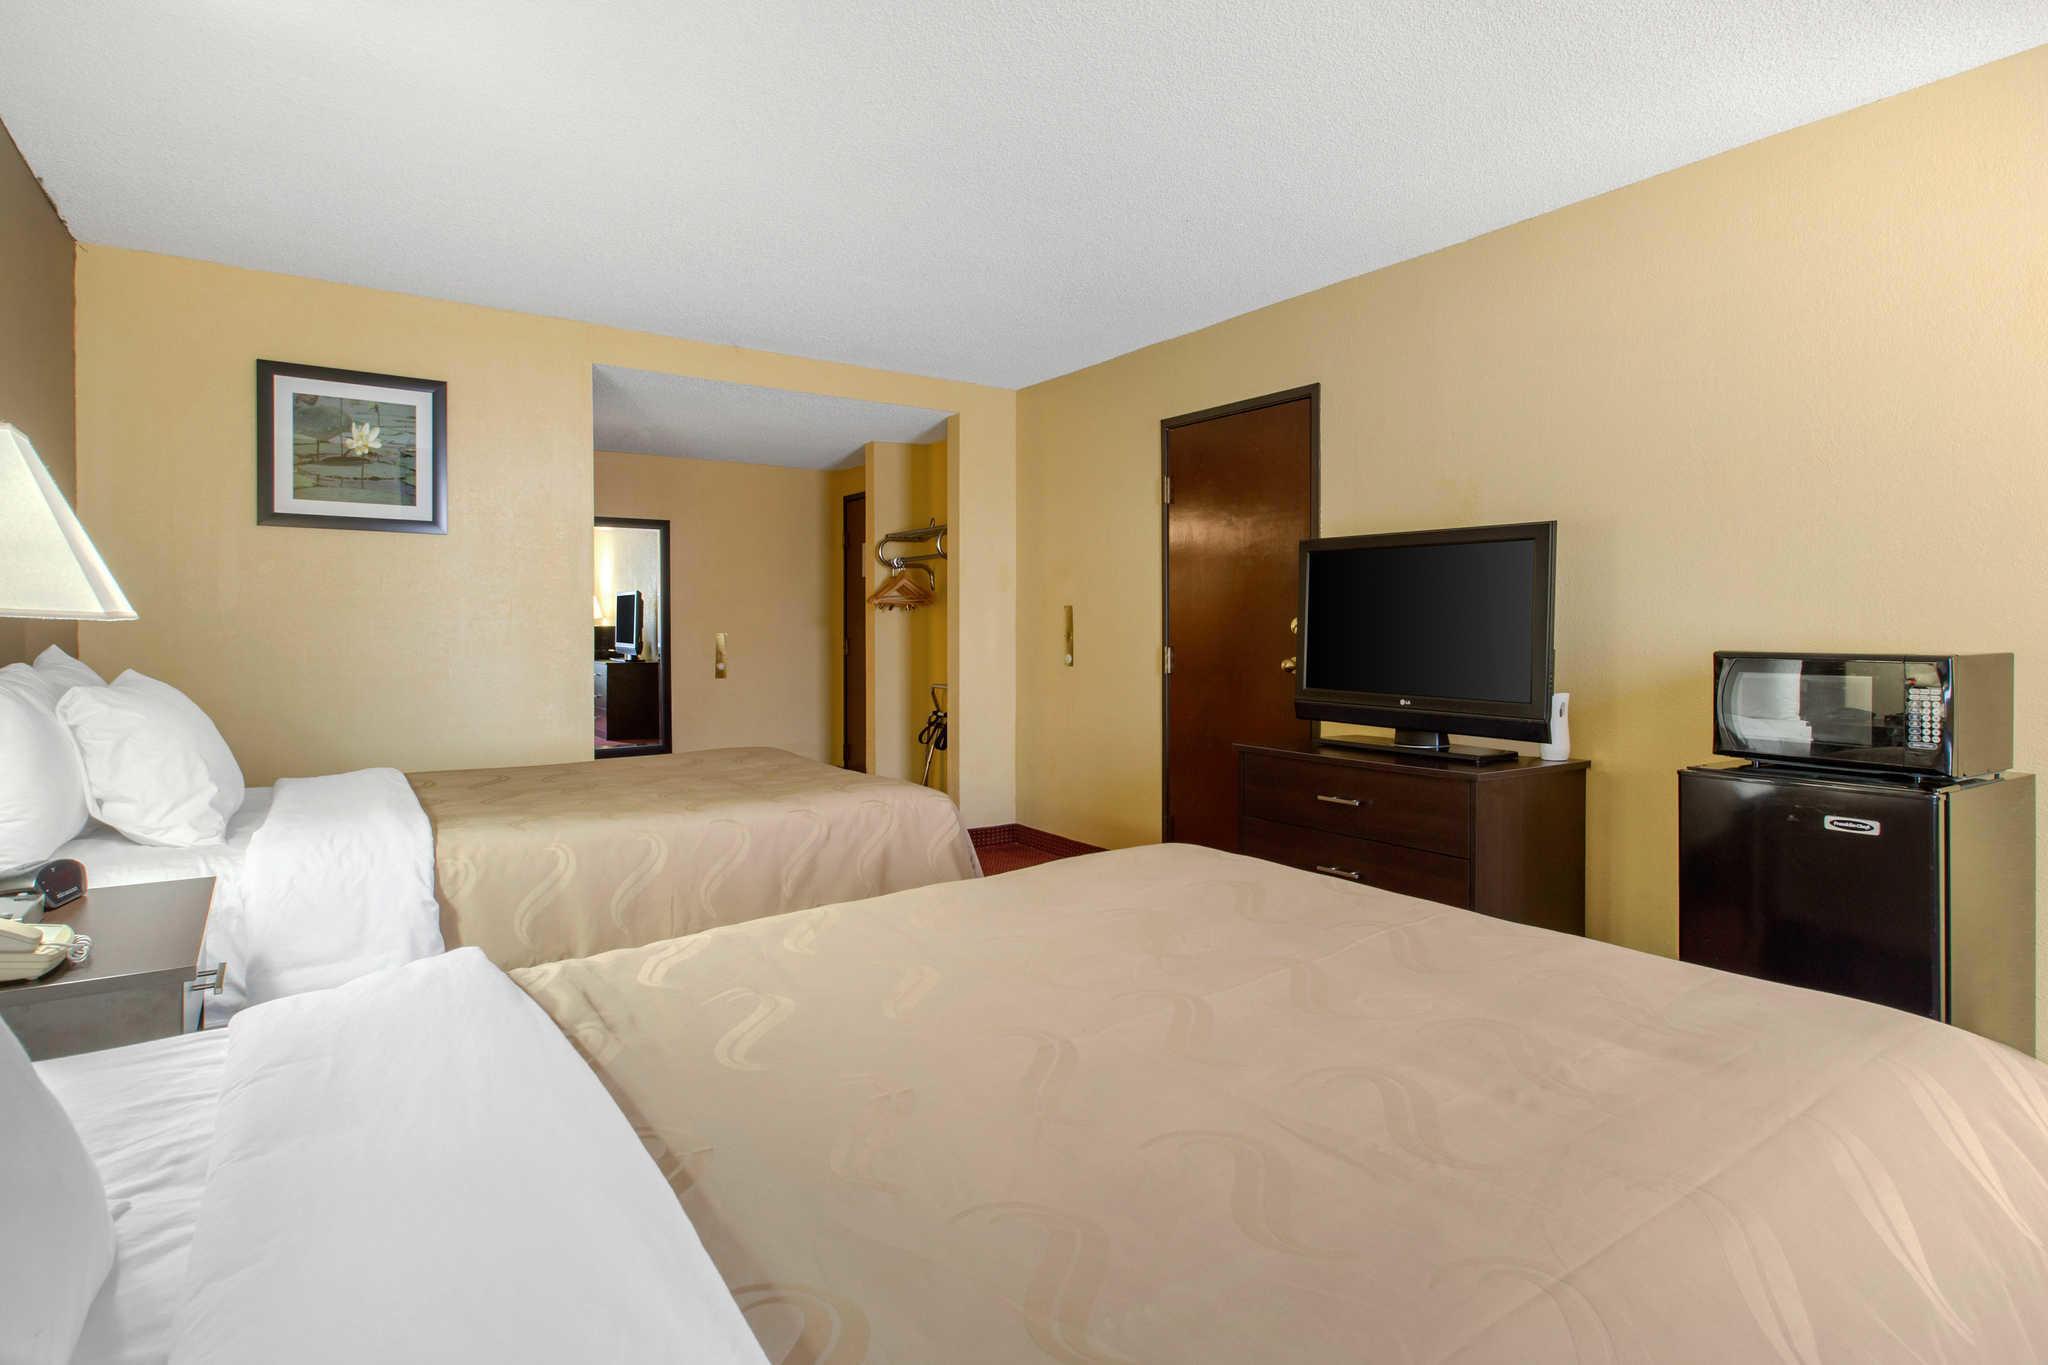 Quality Inn image 22